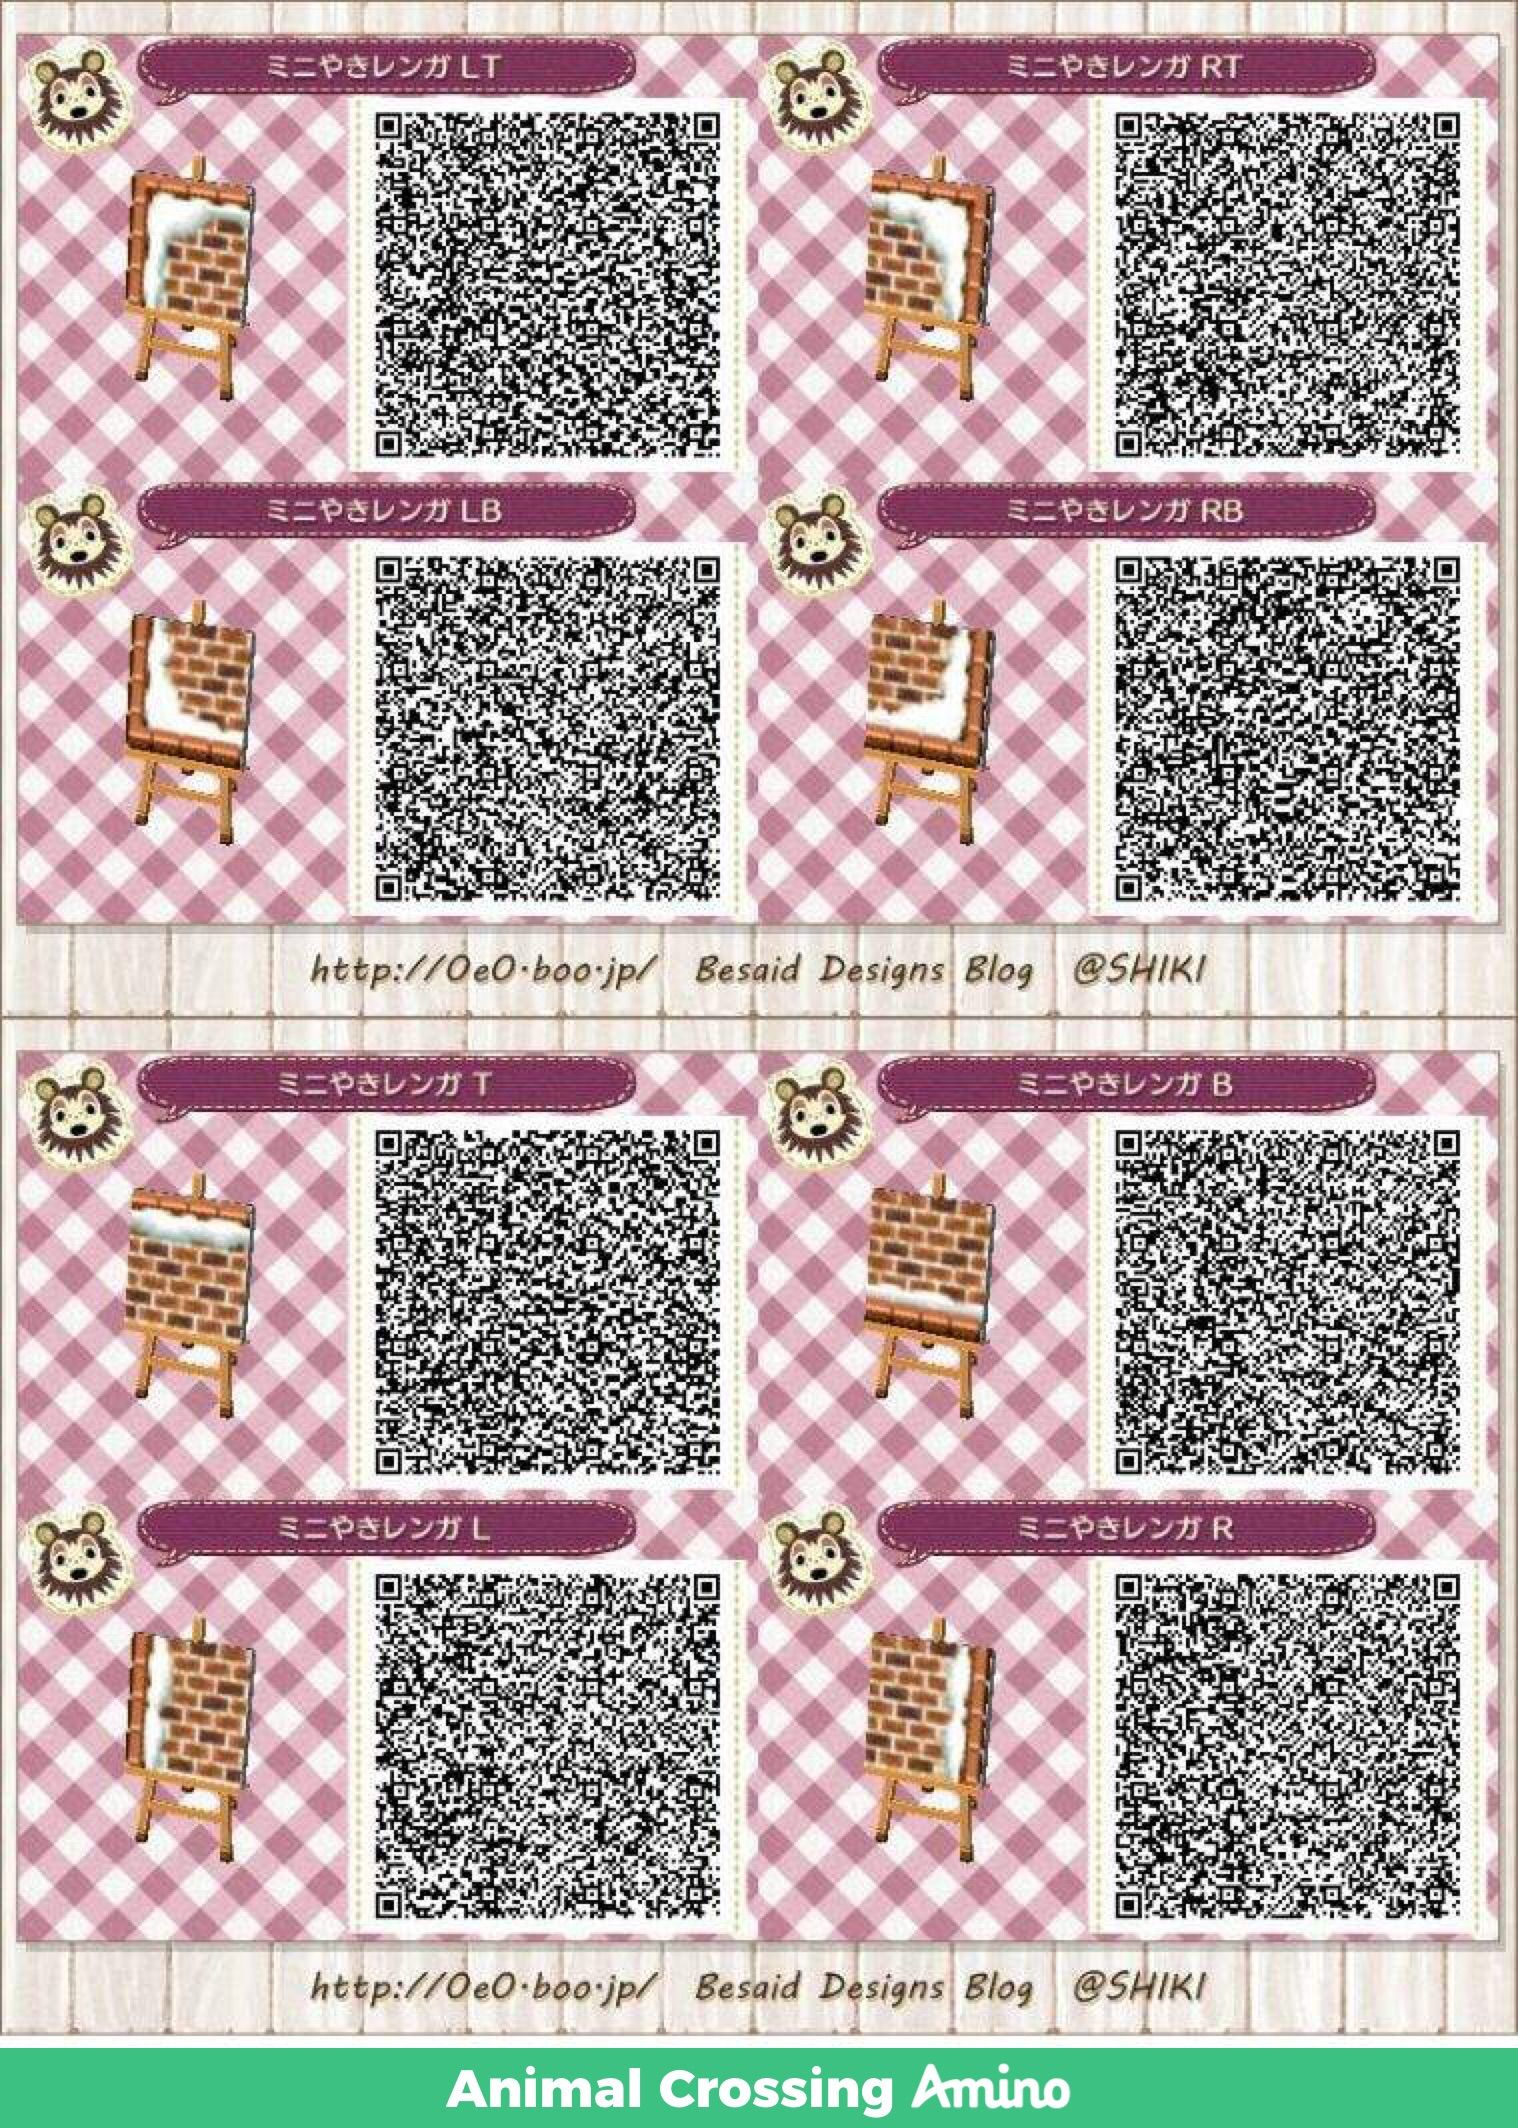 Pin by ouma kokichi on Acnl | Pinterest | Qr codes, Animal crossing Qr Code Animalcrossing Happy Home Designer Clothing Html on